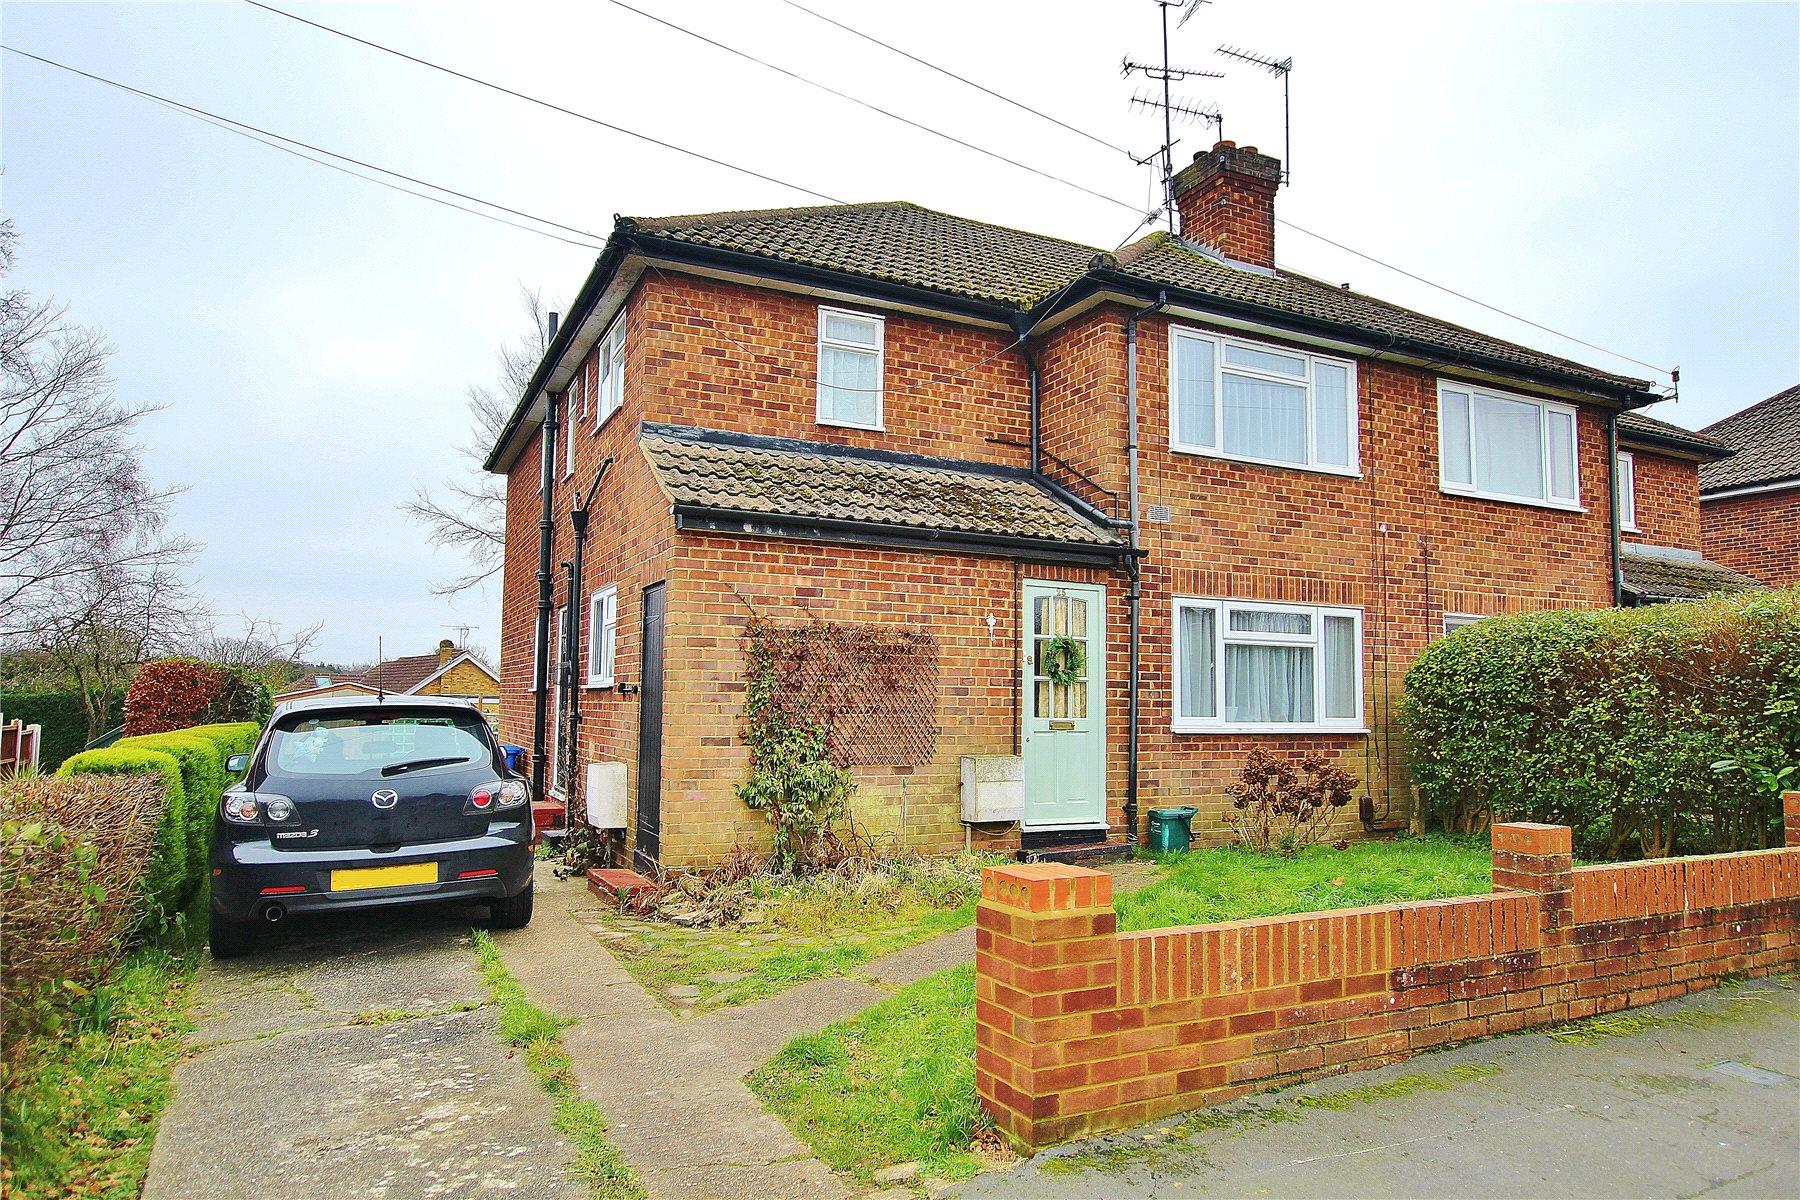 2 Bedrooms Maisonette Flat for sale in Hermitage Woods Crescent, St Johns, Woking, Surrey, GU21